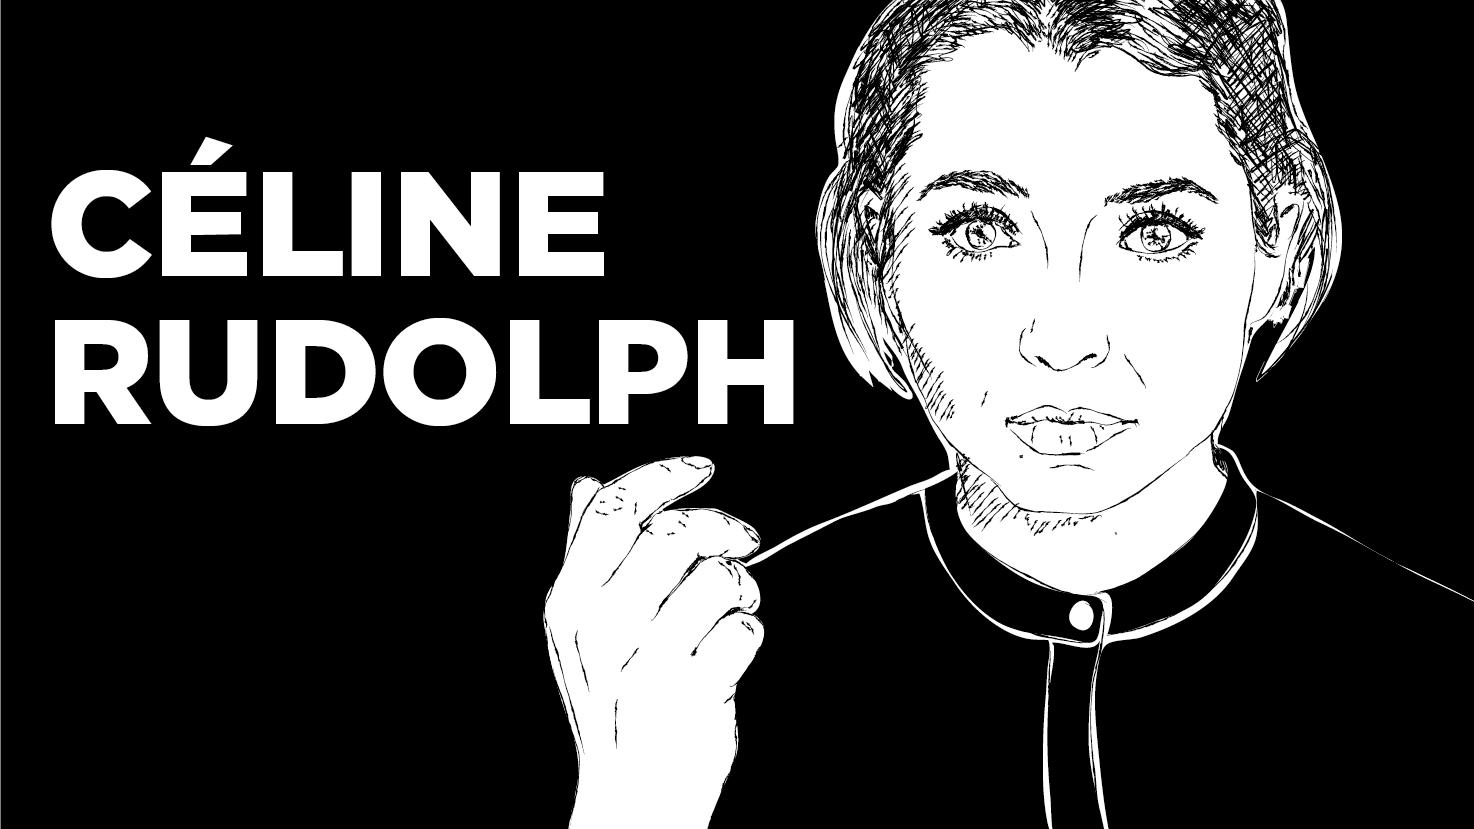 Celine Rudolph